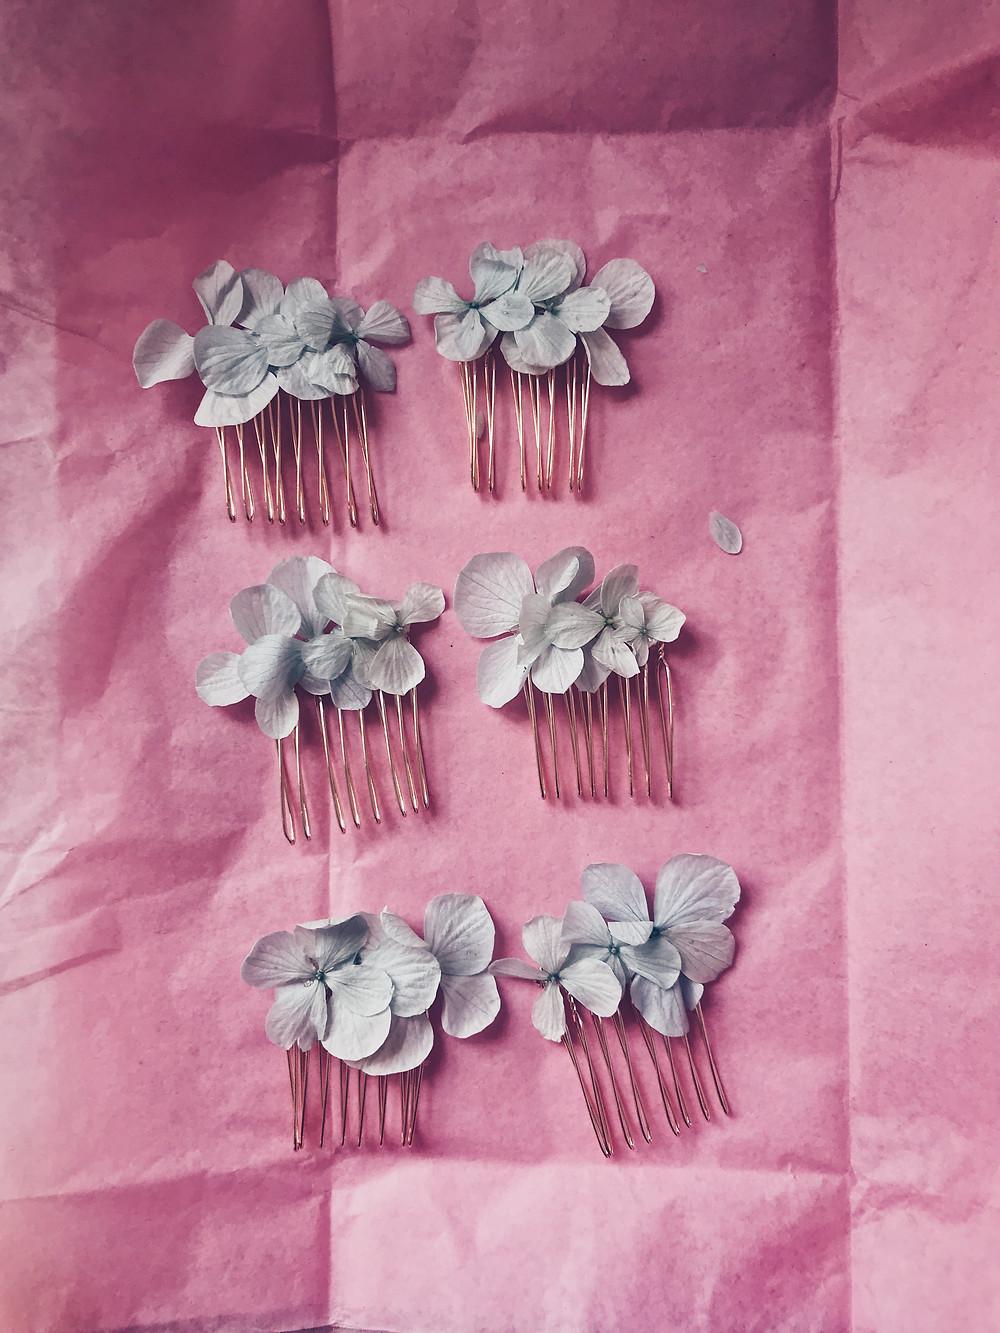 Hydrangea hair grip pin slides accessories Lauren wheeler Claire Bemister photography